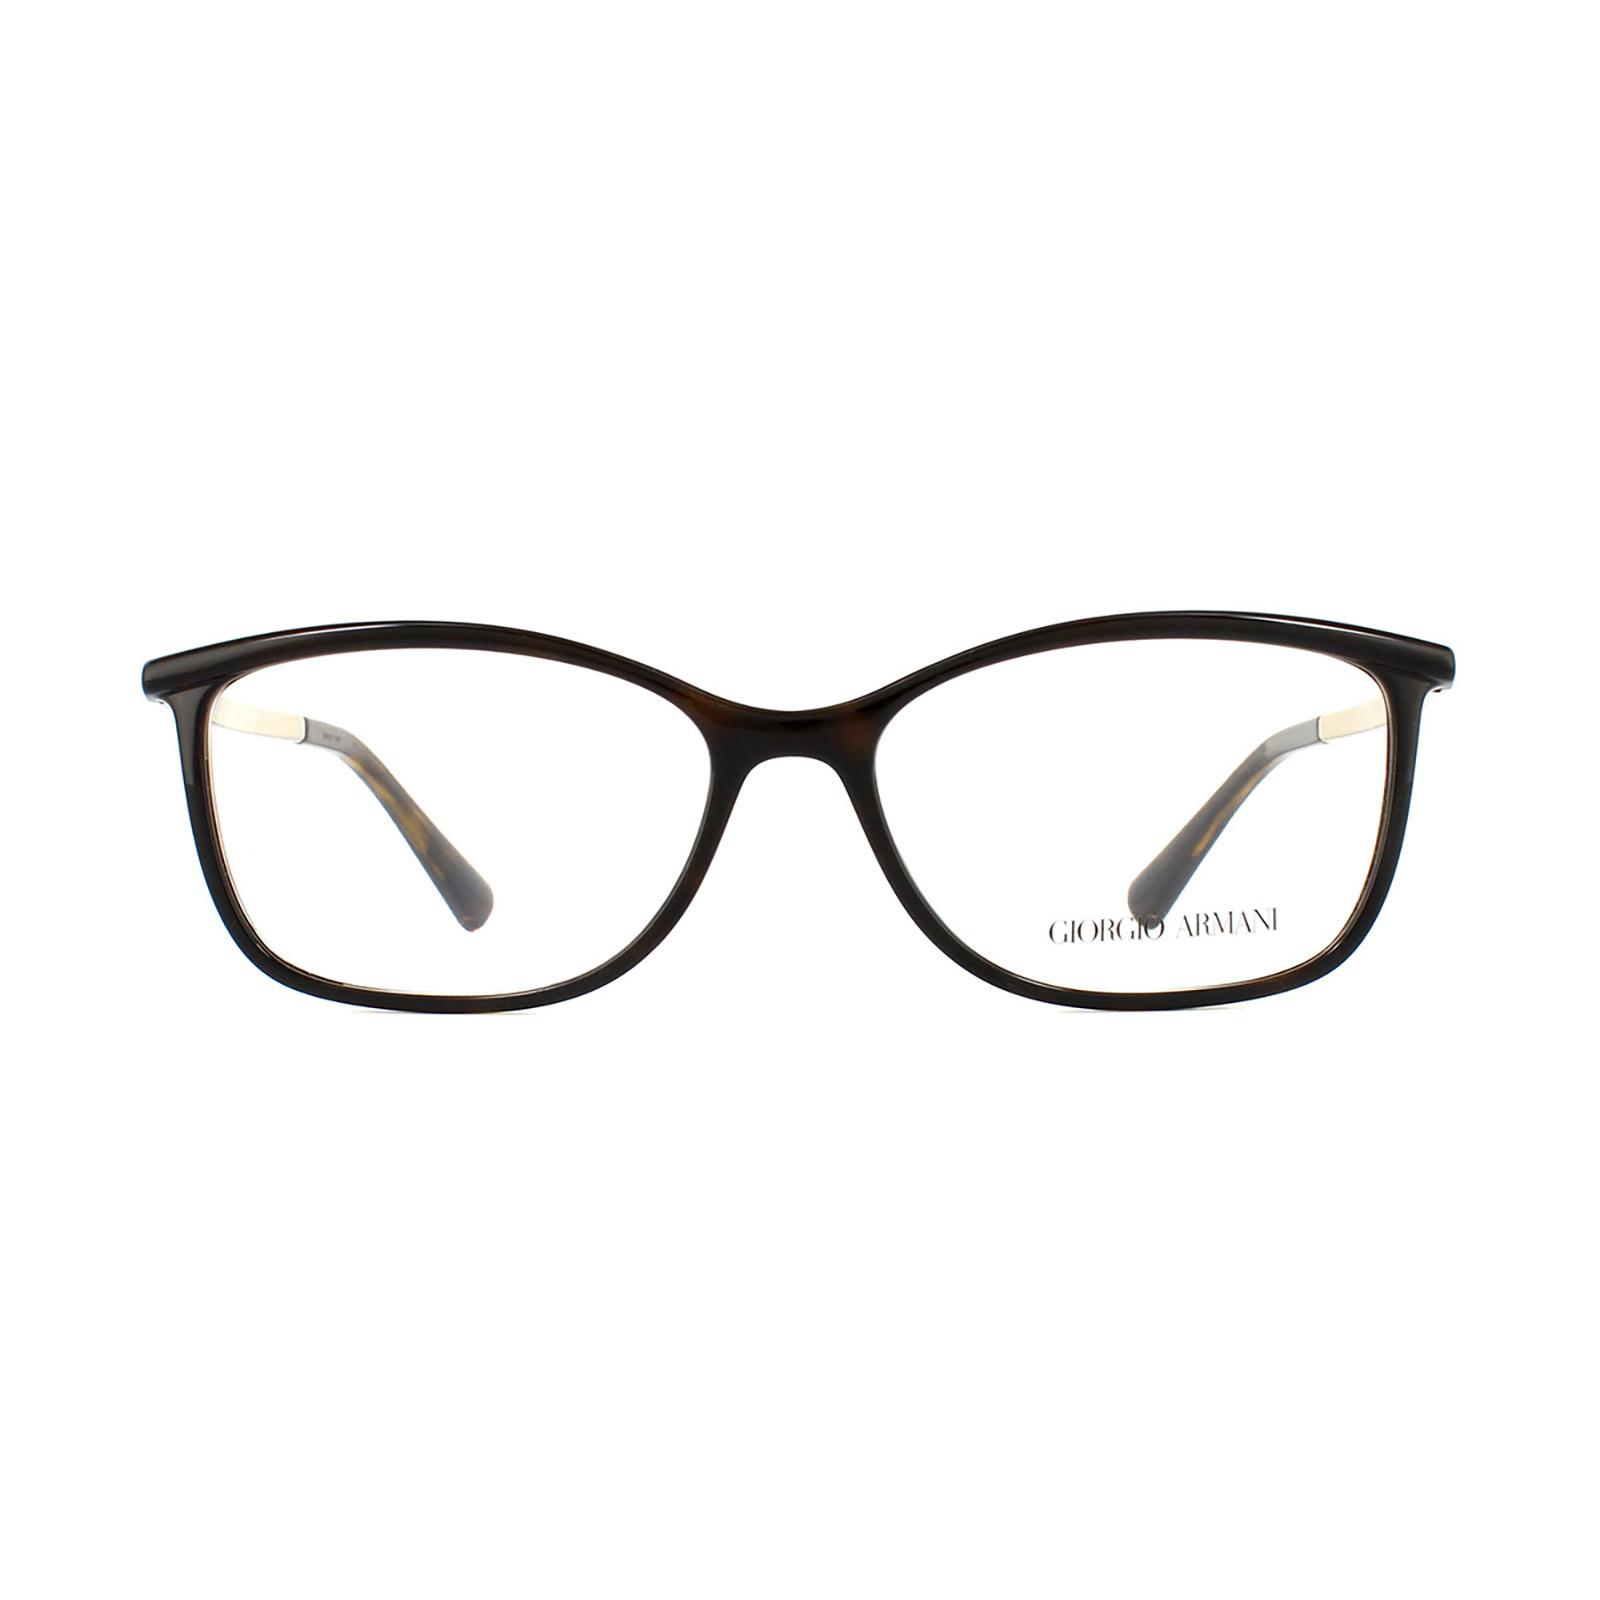 Giorgio Armani Glasses Frames 7093 5026 Havana Womens 53mm | eBay